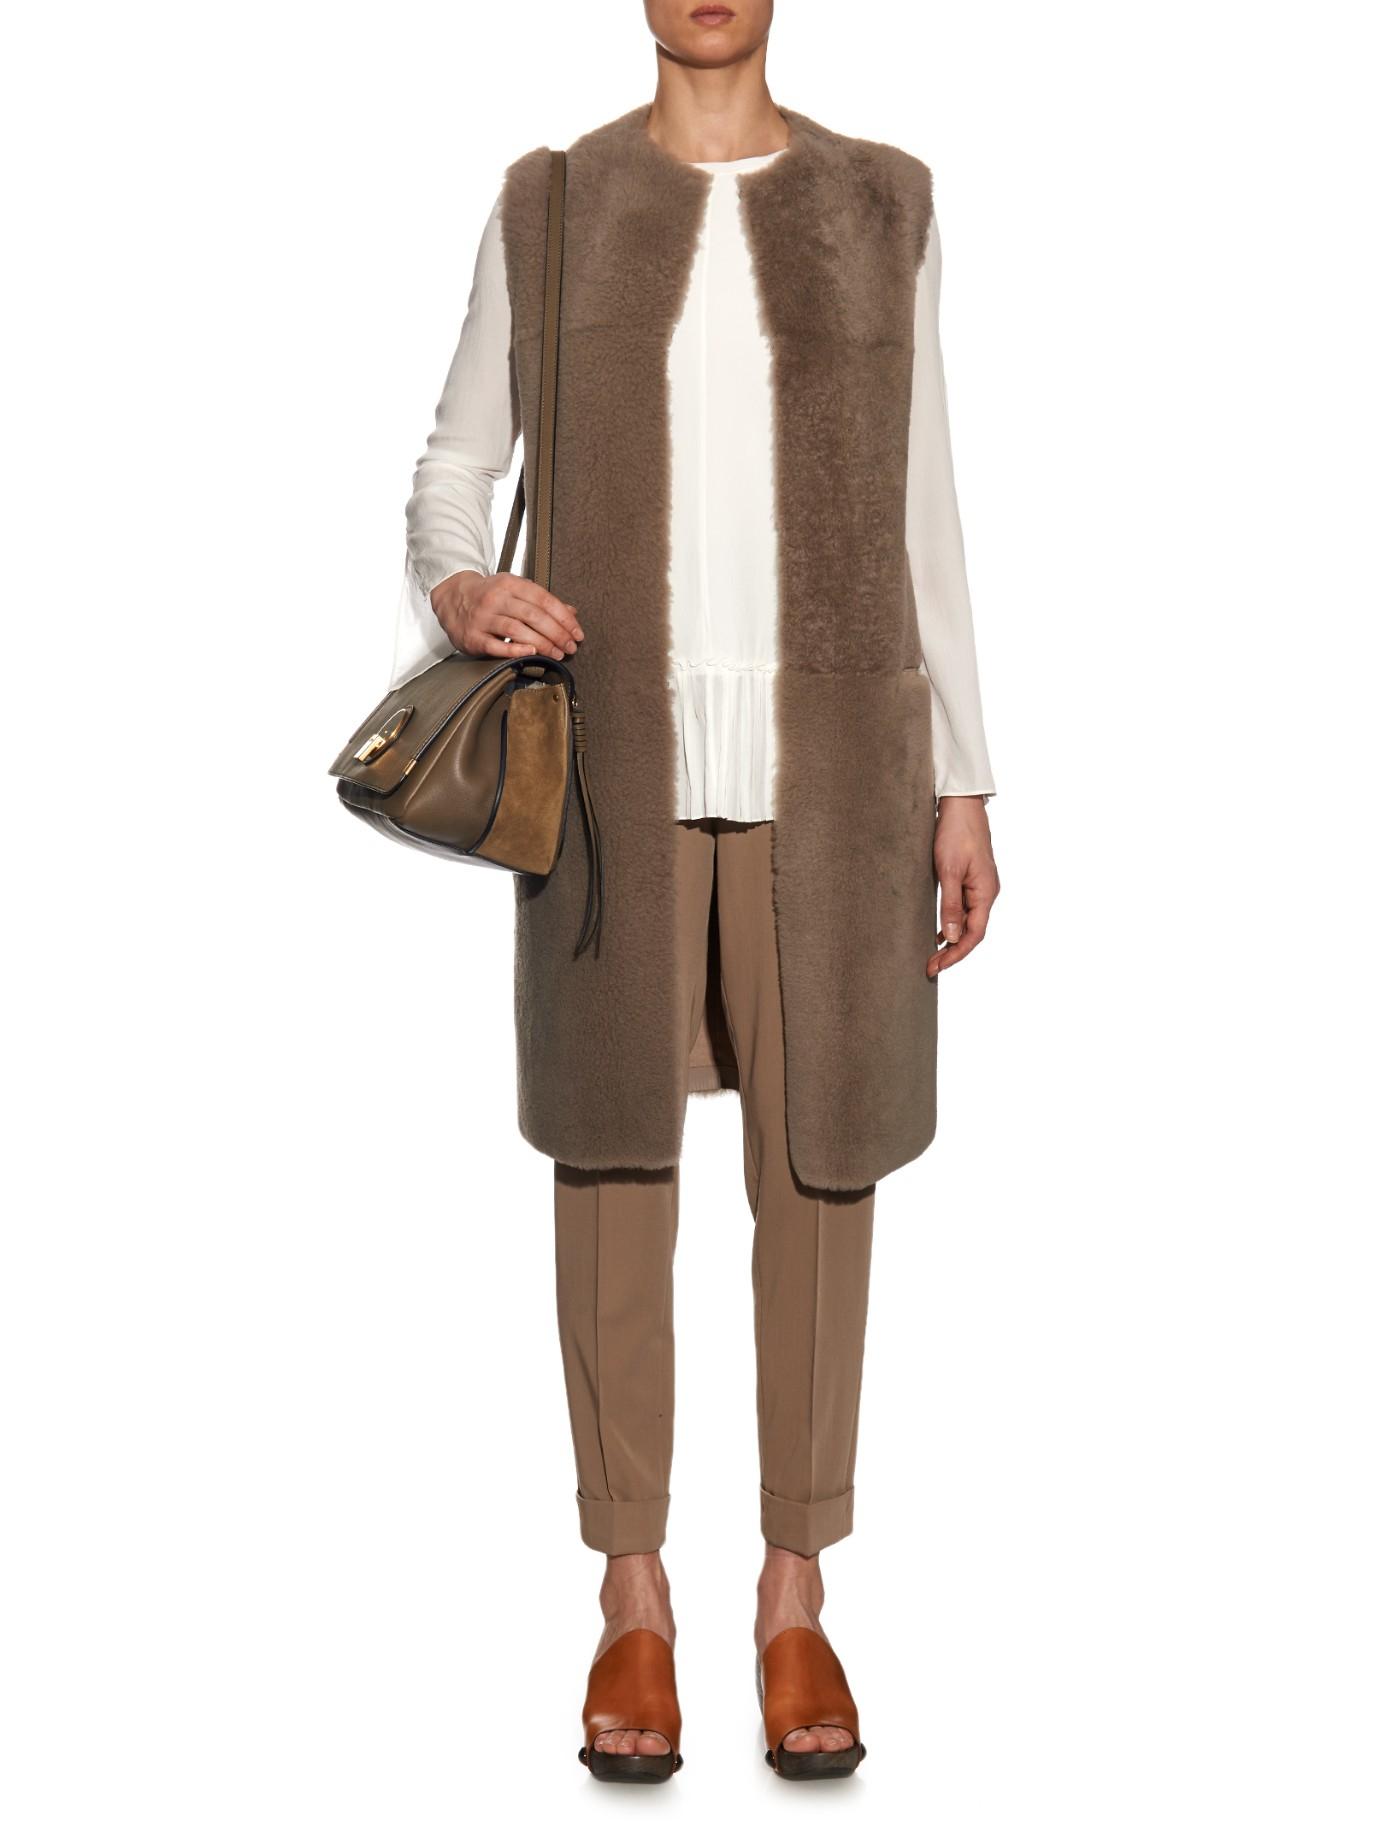 bag chloe - chloe crocodile effect indy tote, chloe replica handbags uk